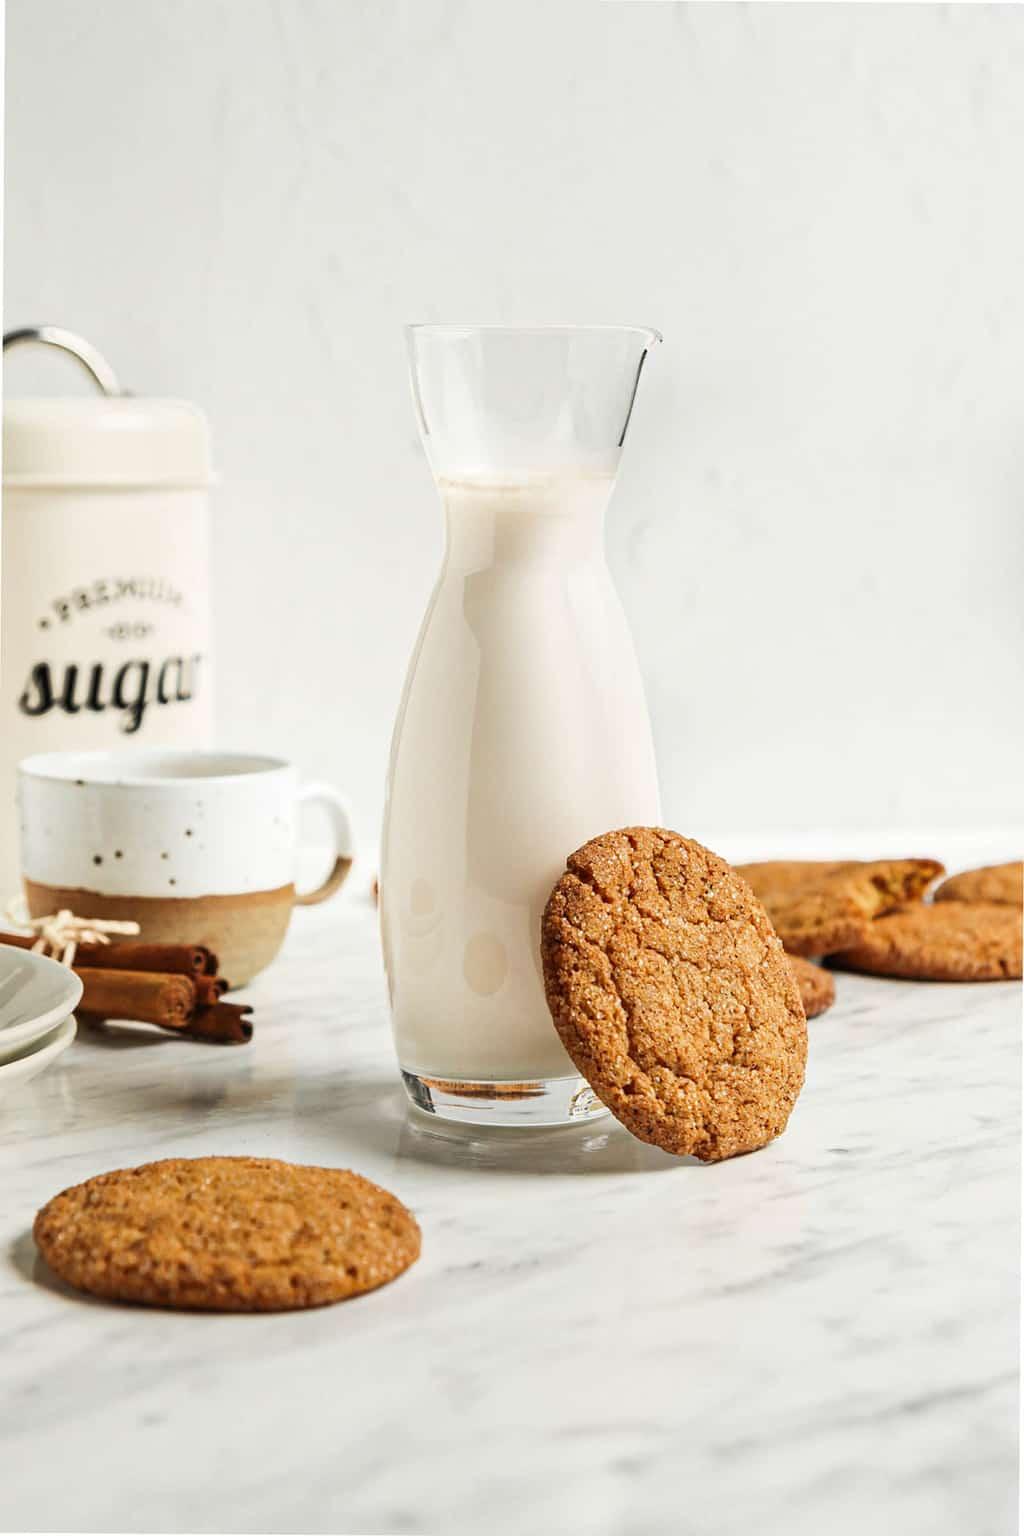 carafe of milk with pumpkin snickerdoodle on the side. pumpkin snickerdoodles in the background with mug, cinnamon, and sugar.